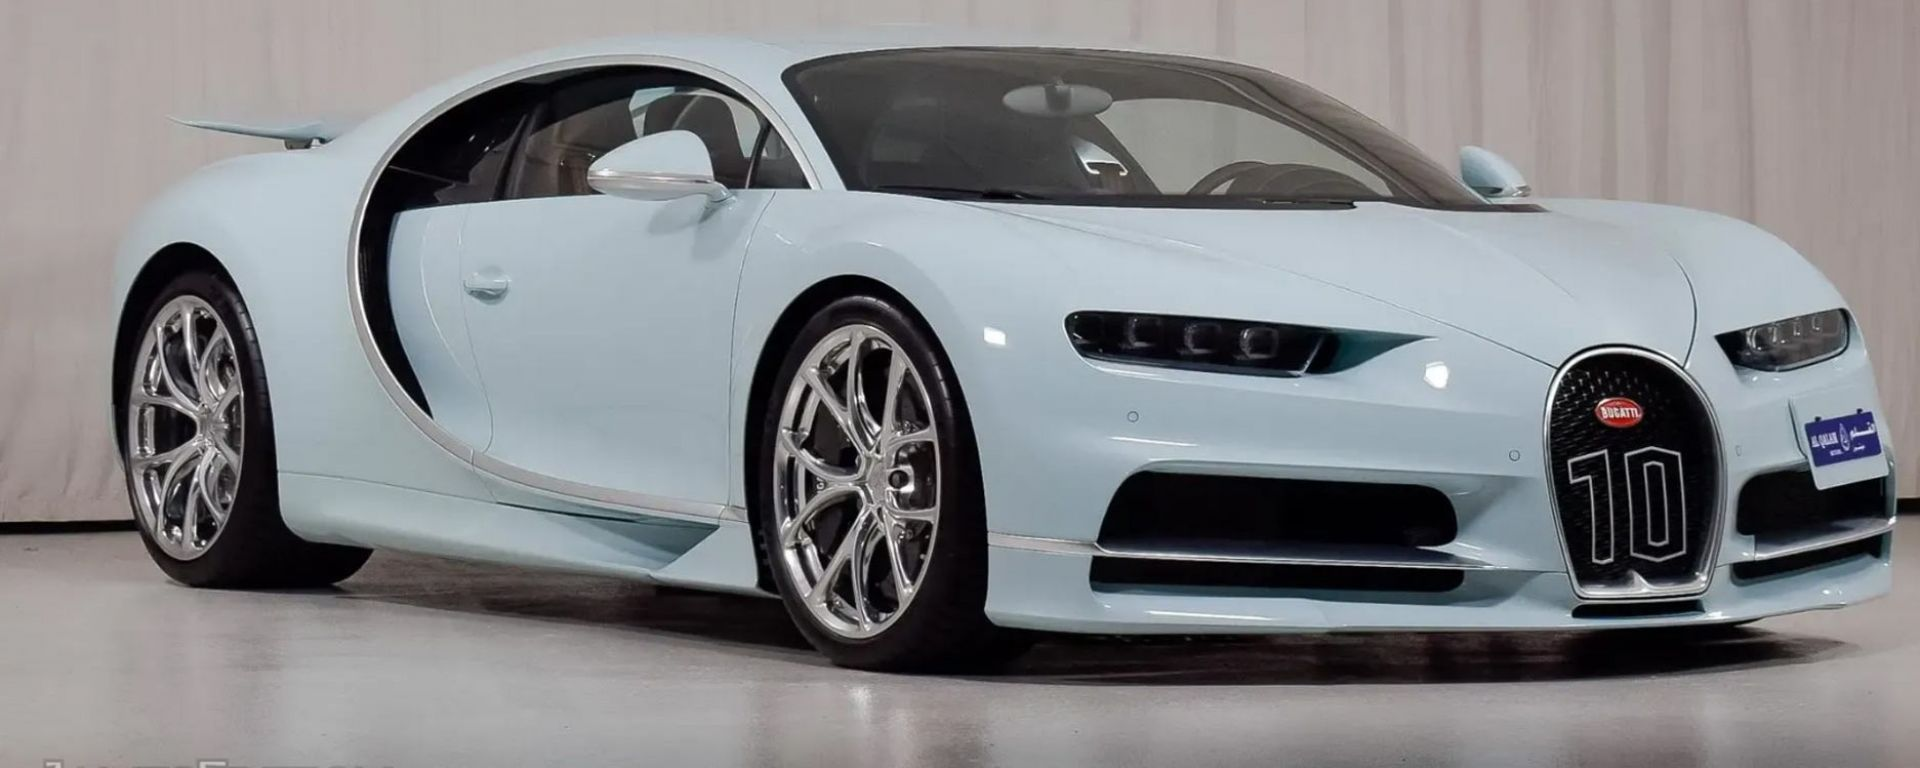 Bugatti Chiron Vainqueur de Coeur: vista 3/4 anteriore